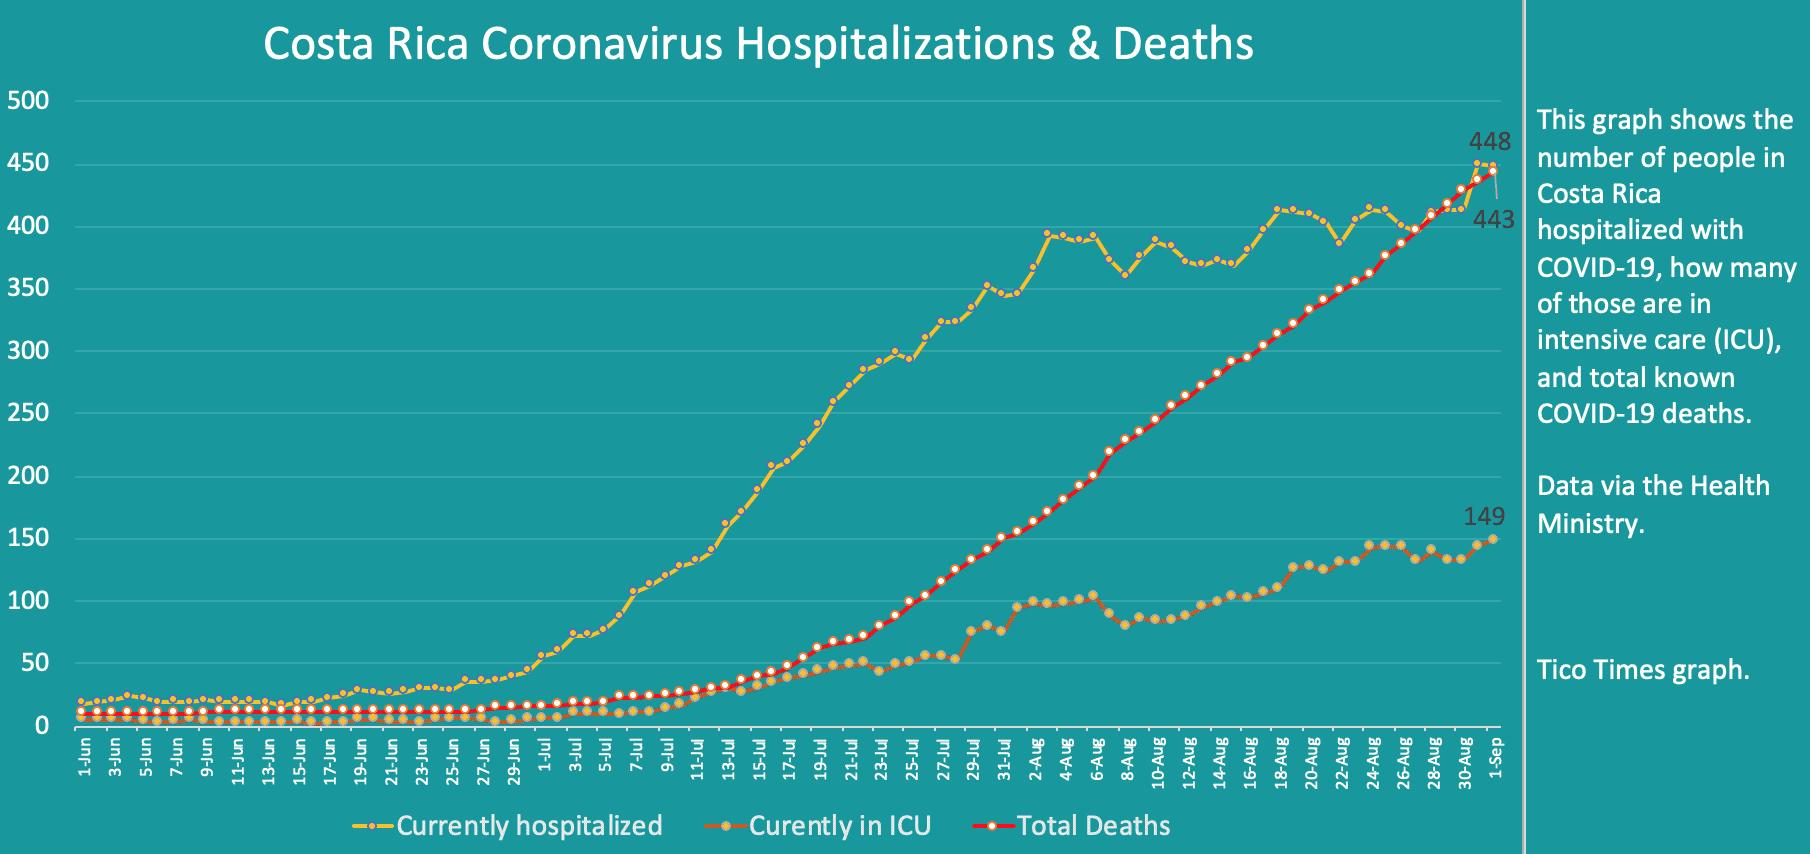 Costa Rica coronavirus hospitalizations and deaths on September 1, 2020